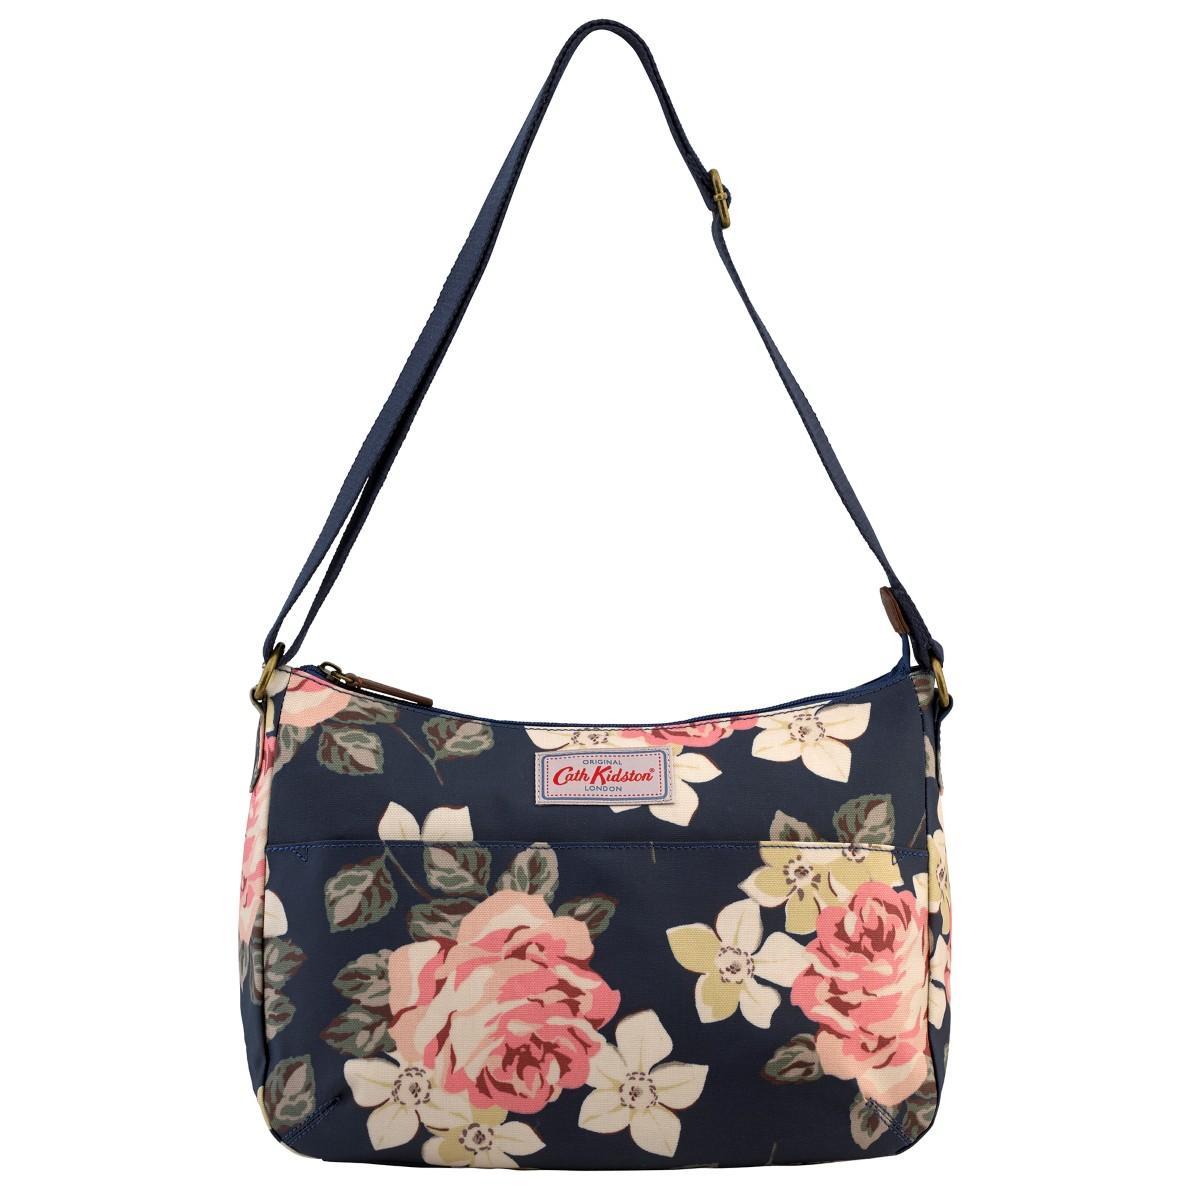 7d05fcbff Cath Kidston Matt Oilcloth The All Day Bag Crossbody Handbag Richmond Rose  Colour Dark Navy 556767